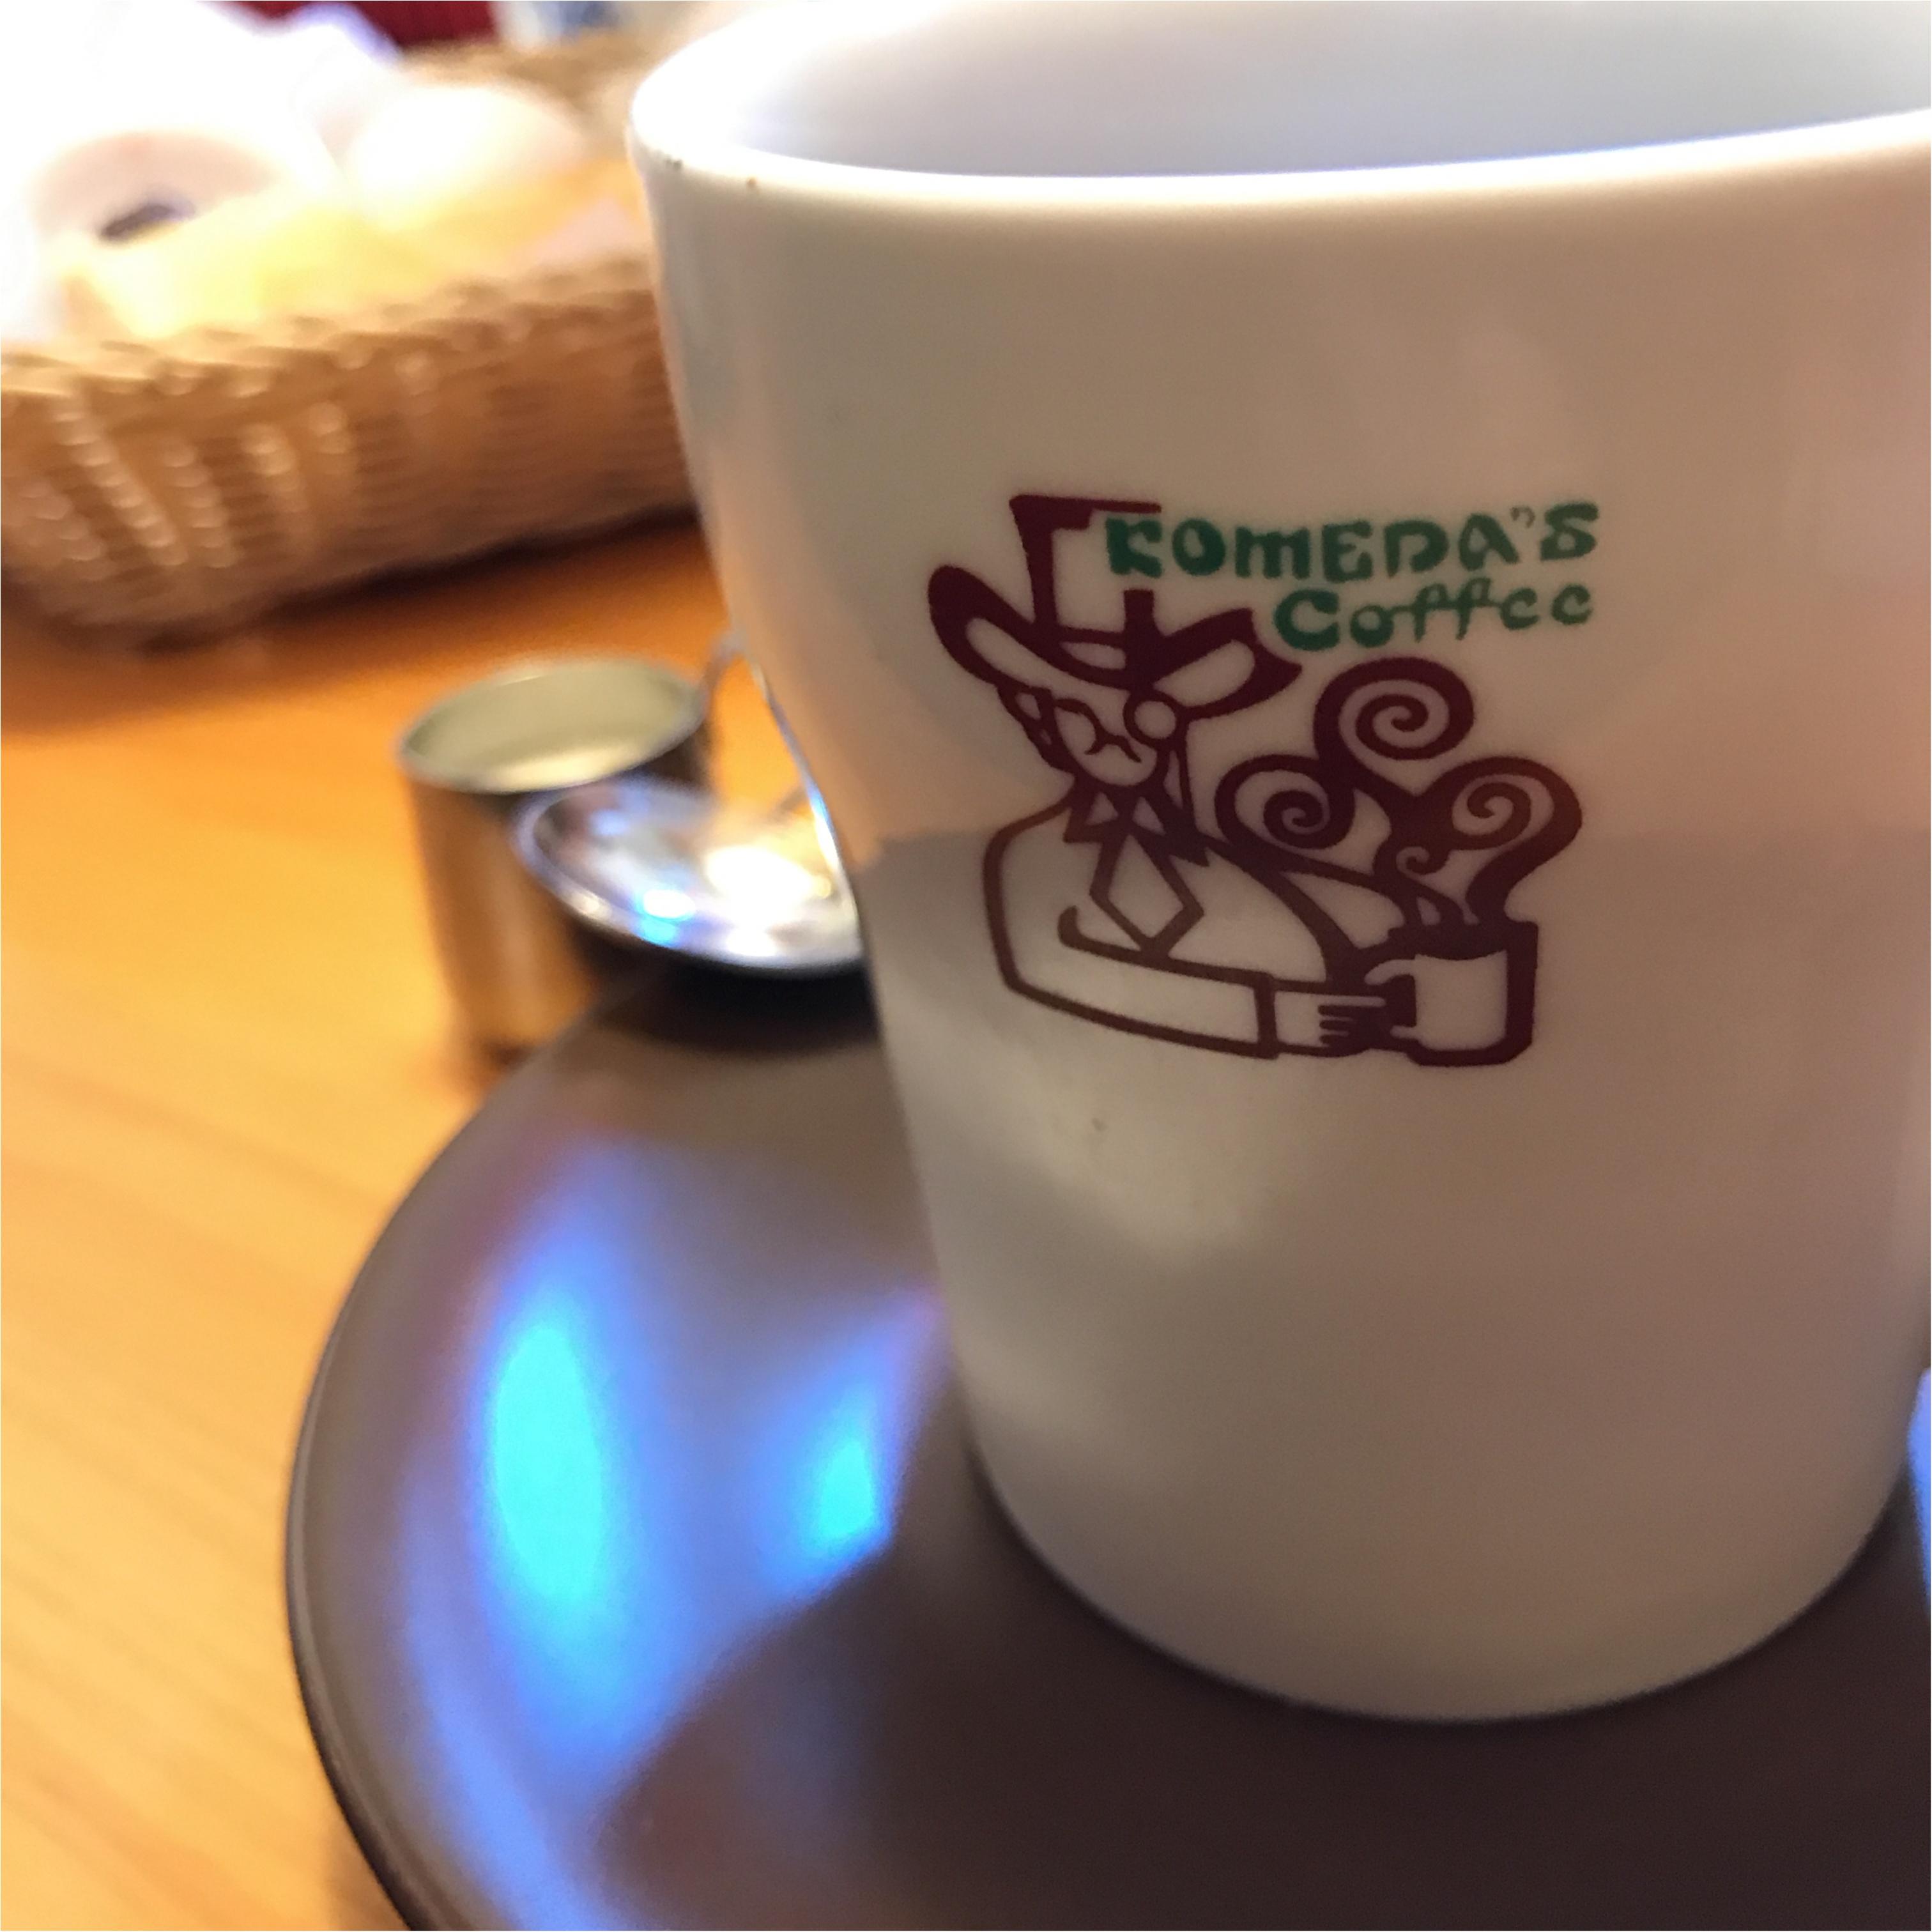 【cafe time】コメダ珈琲名物・シロノワールの新作は和テイスト!おいしくて止まらない!!_1